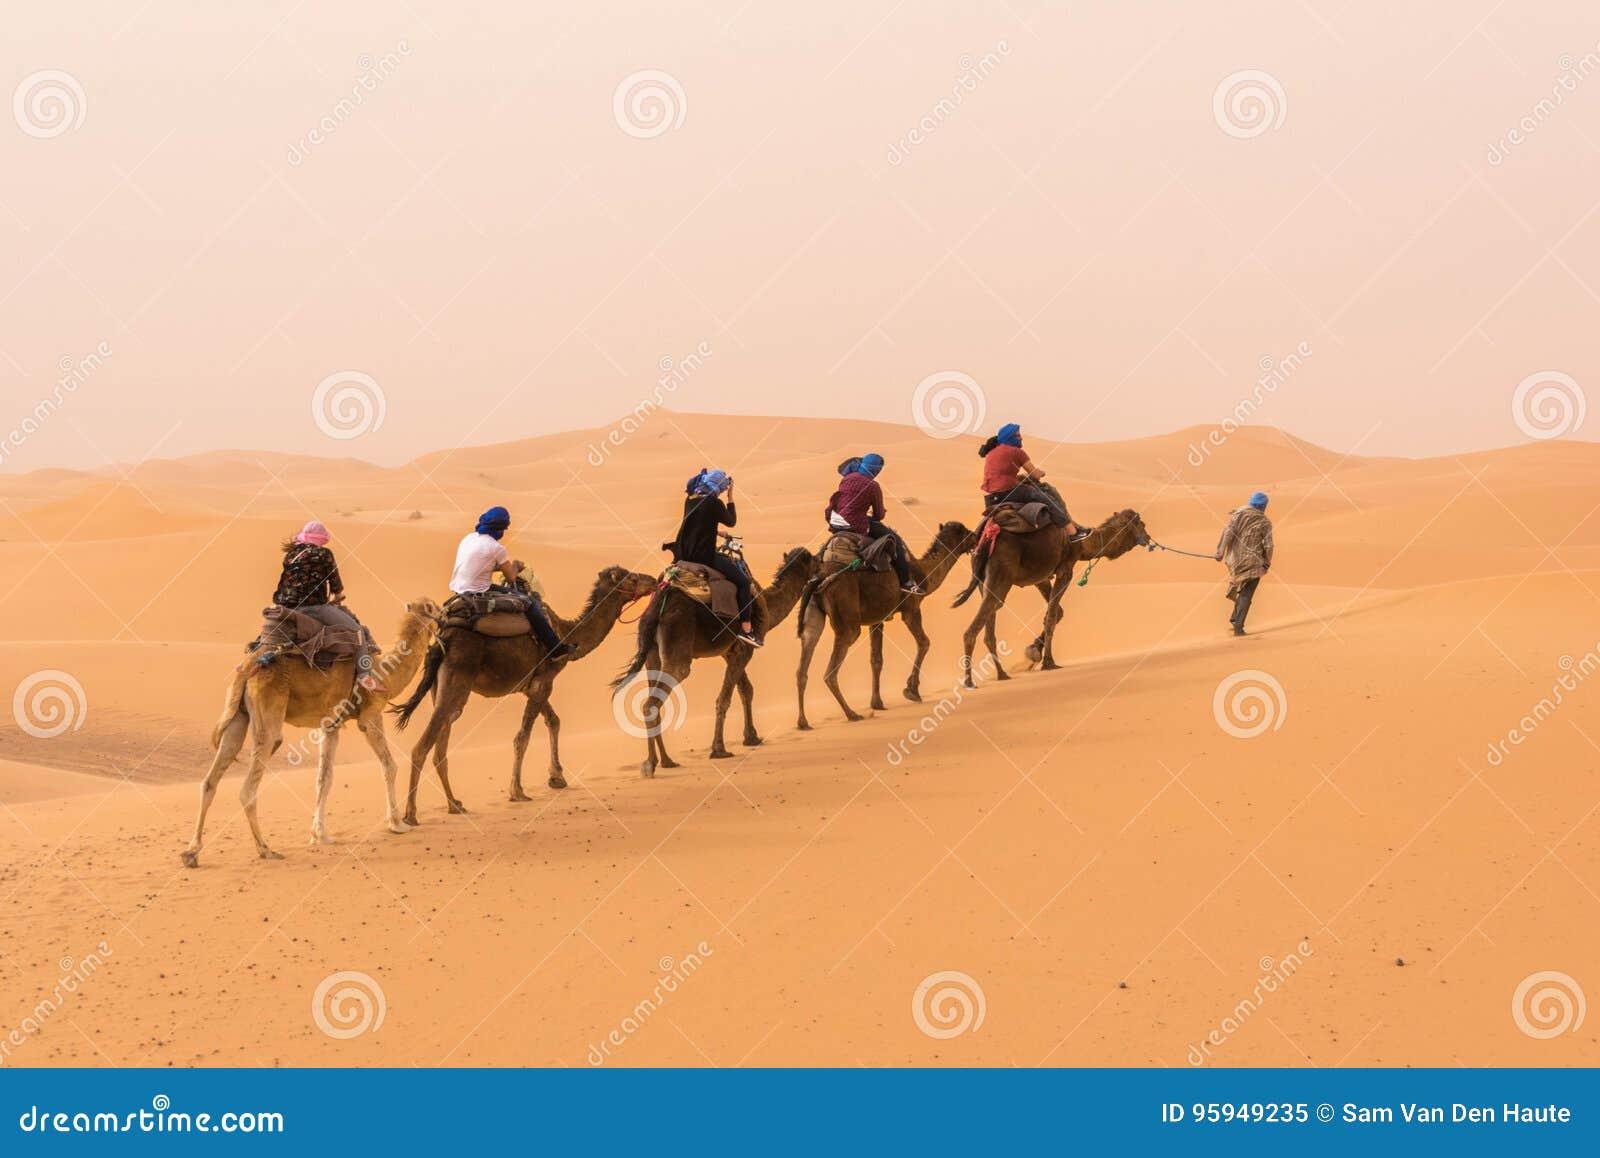 A Caravan Of Camels Walking Through The Moroccan Sahara Desert ...